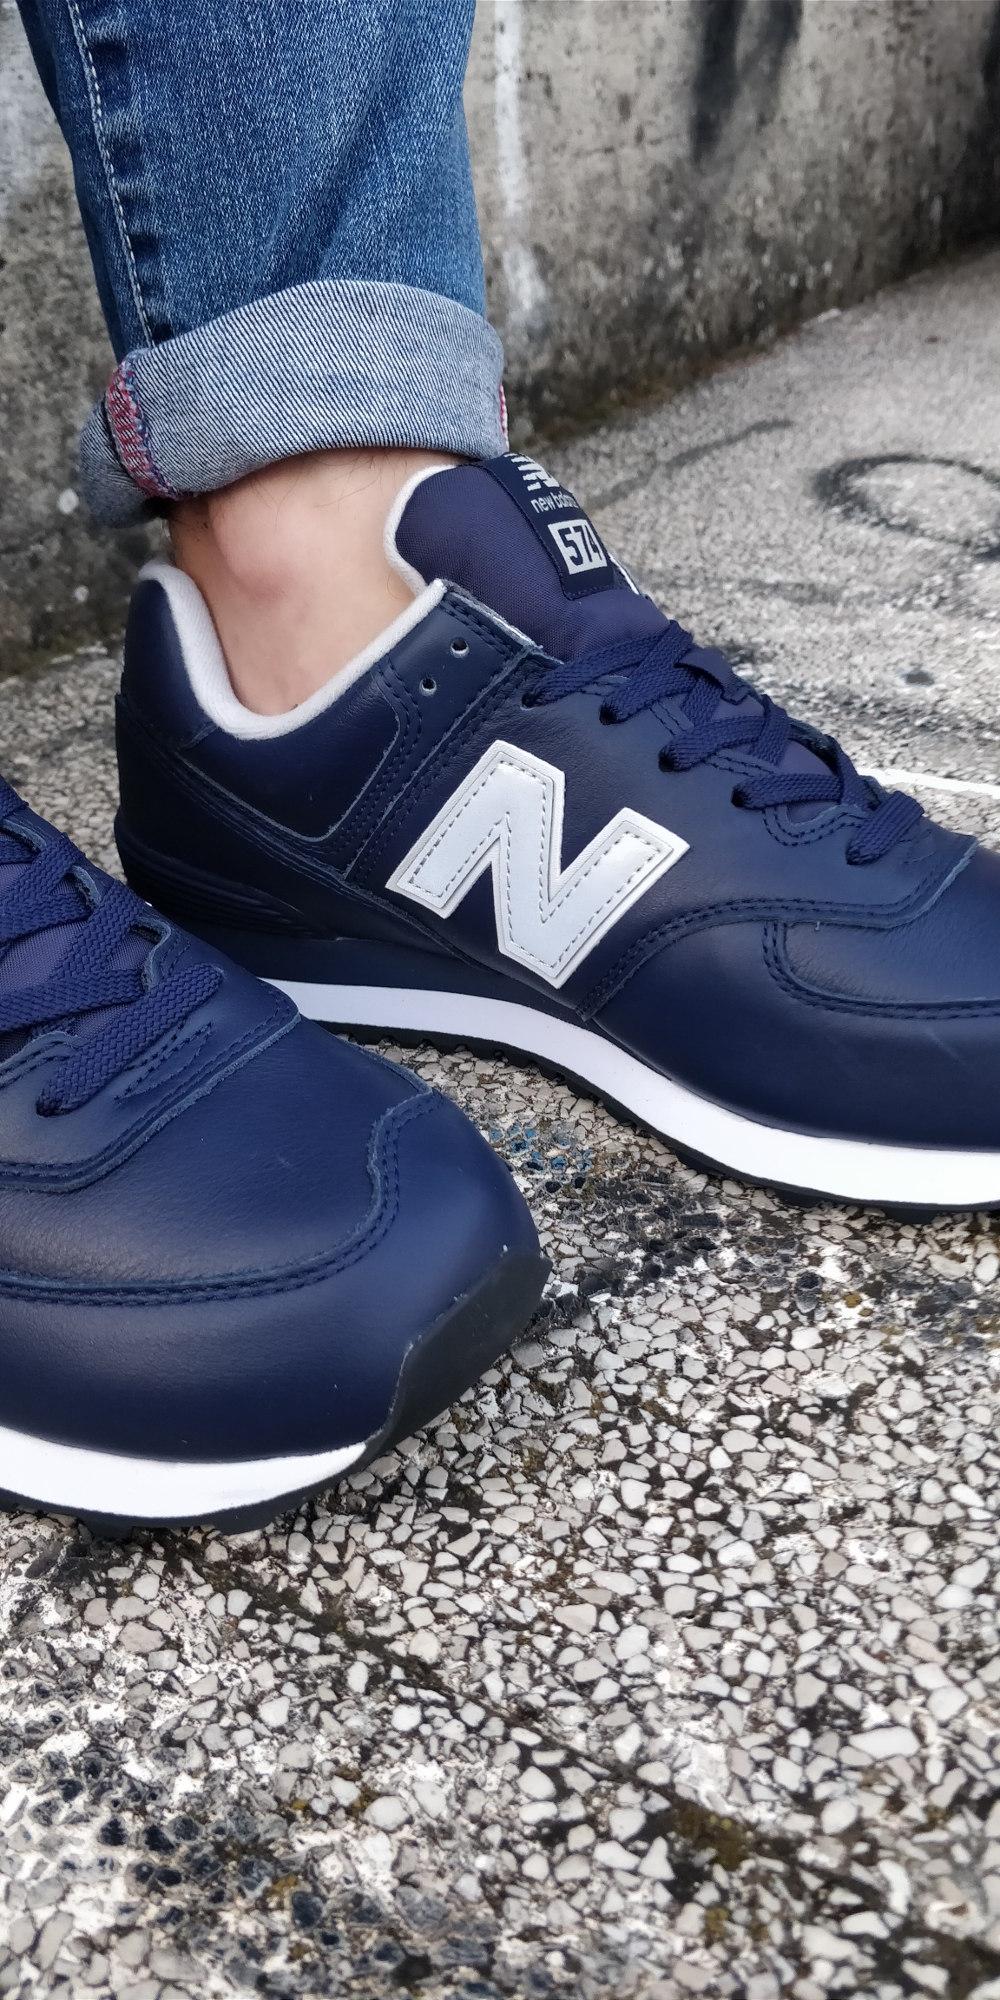 Blu Ml Sneakers 574 Lifestyle Sportive Scarpe Pelle New Uomo Balance Lea Vera aX5wOx88q